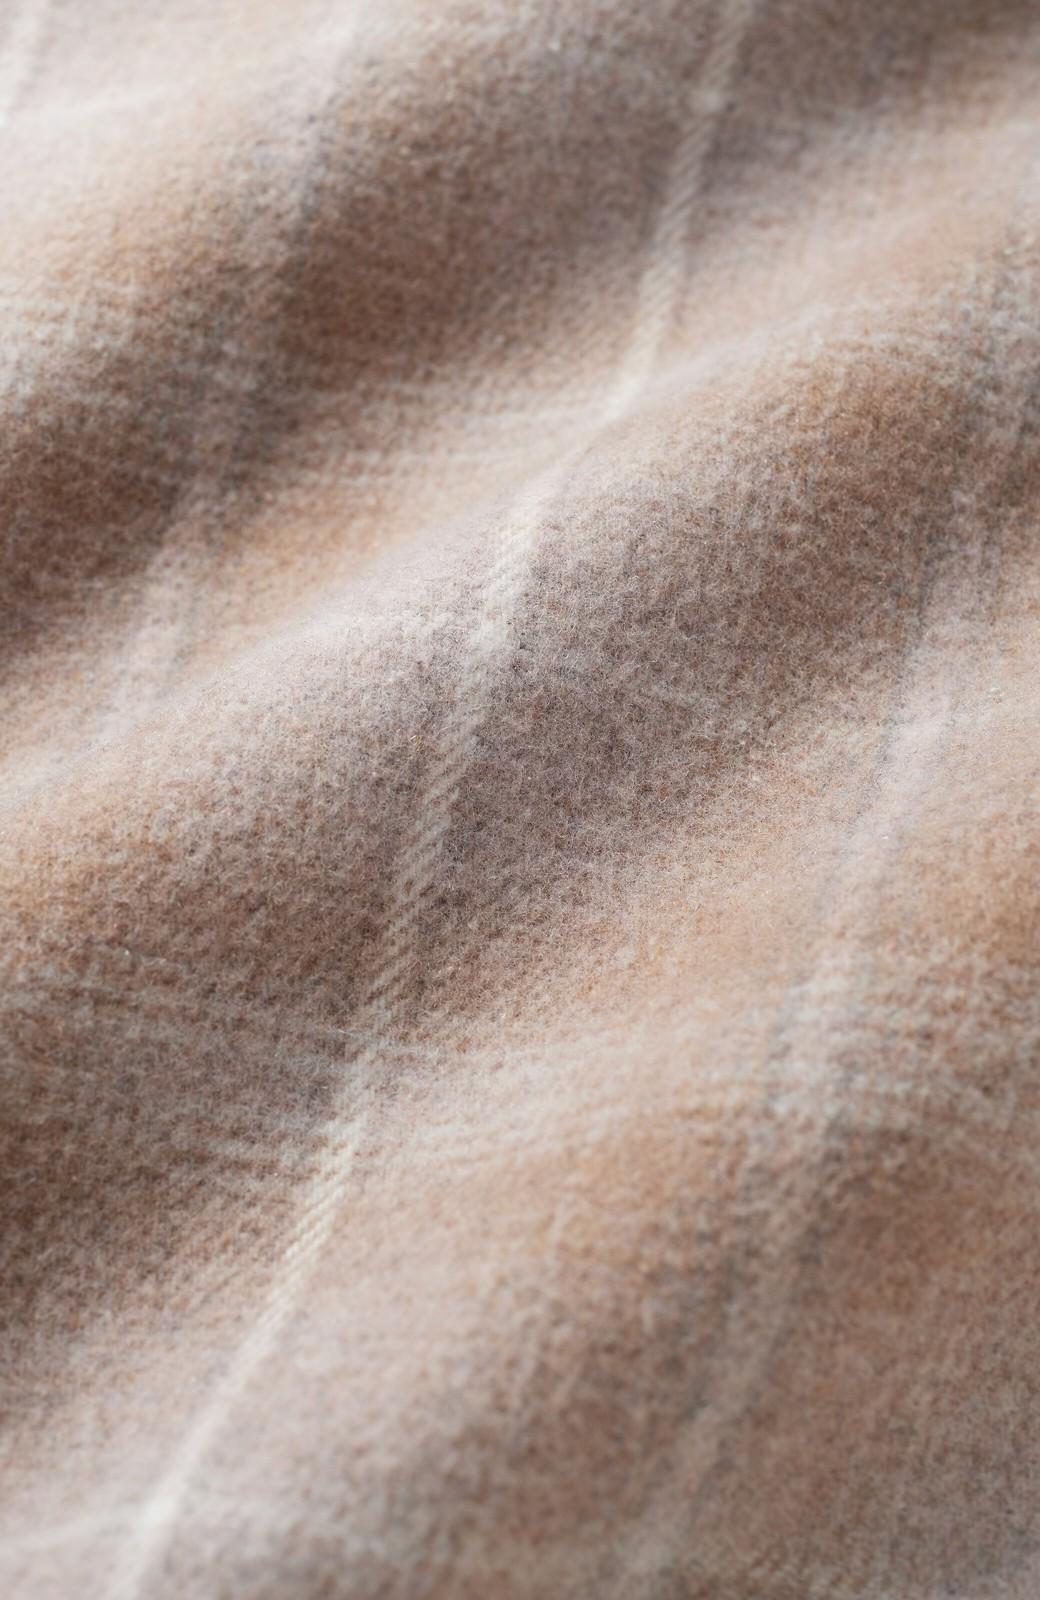 haco! パッと羽織るだけで様になる!カジュアルにも大人っぽくも着られる便利なチェックコート <ベージュ系その他>の商品写真5